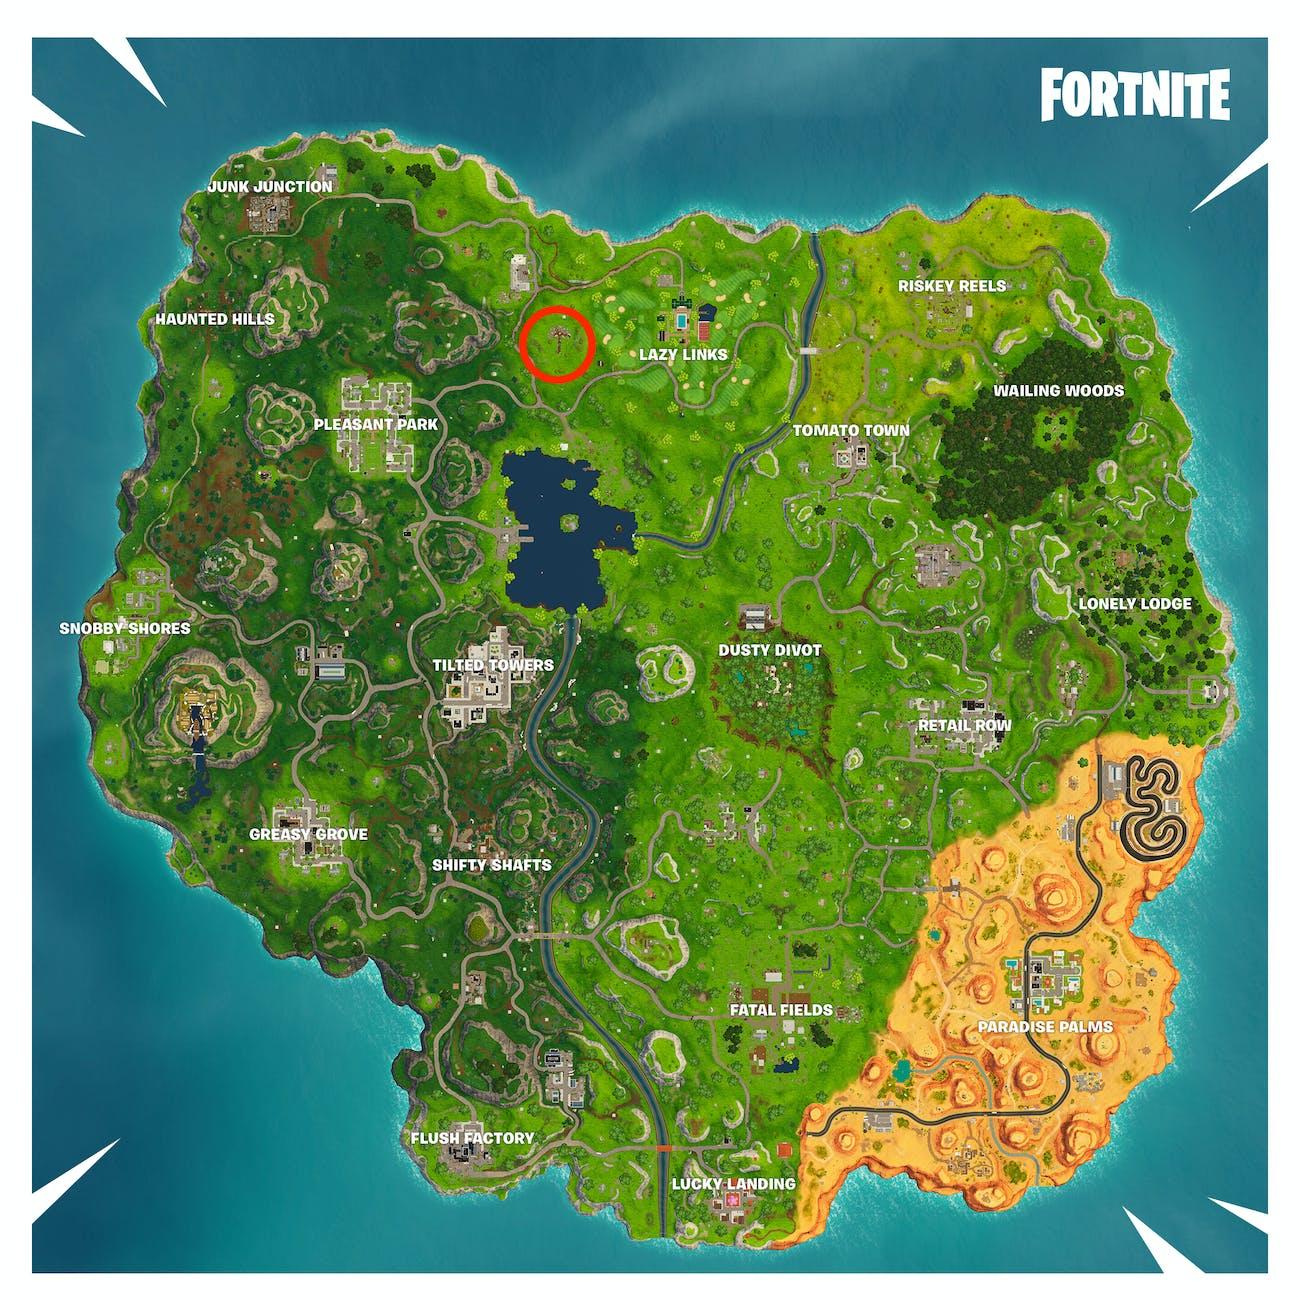 Location of Week 1 Road Trip Battle Star